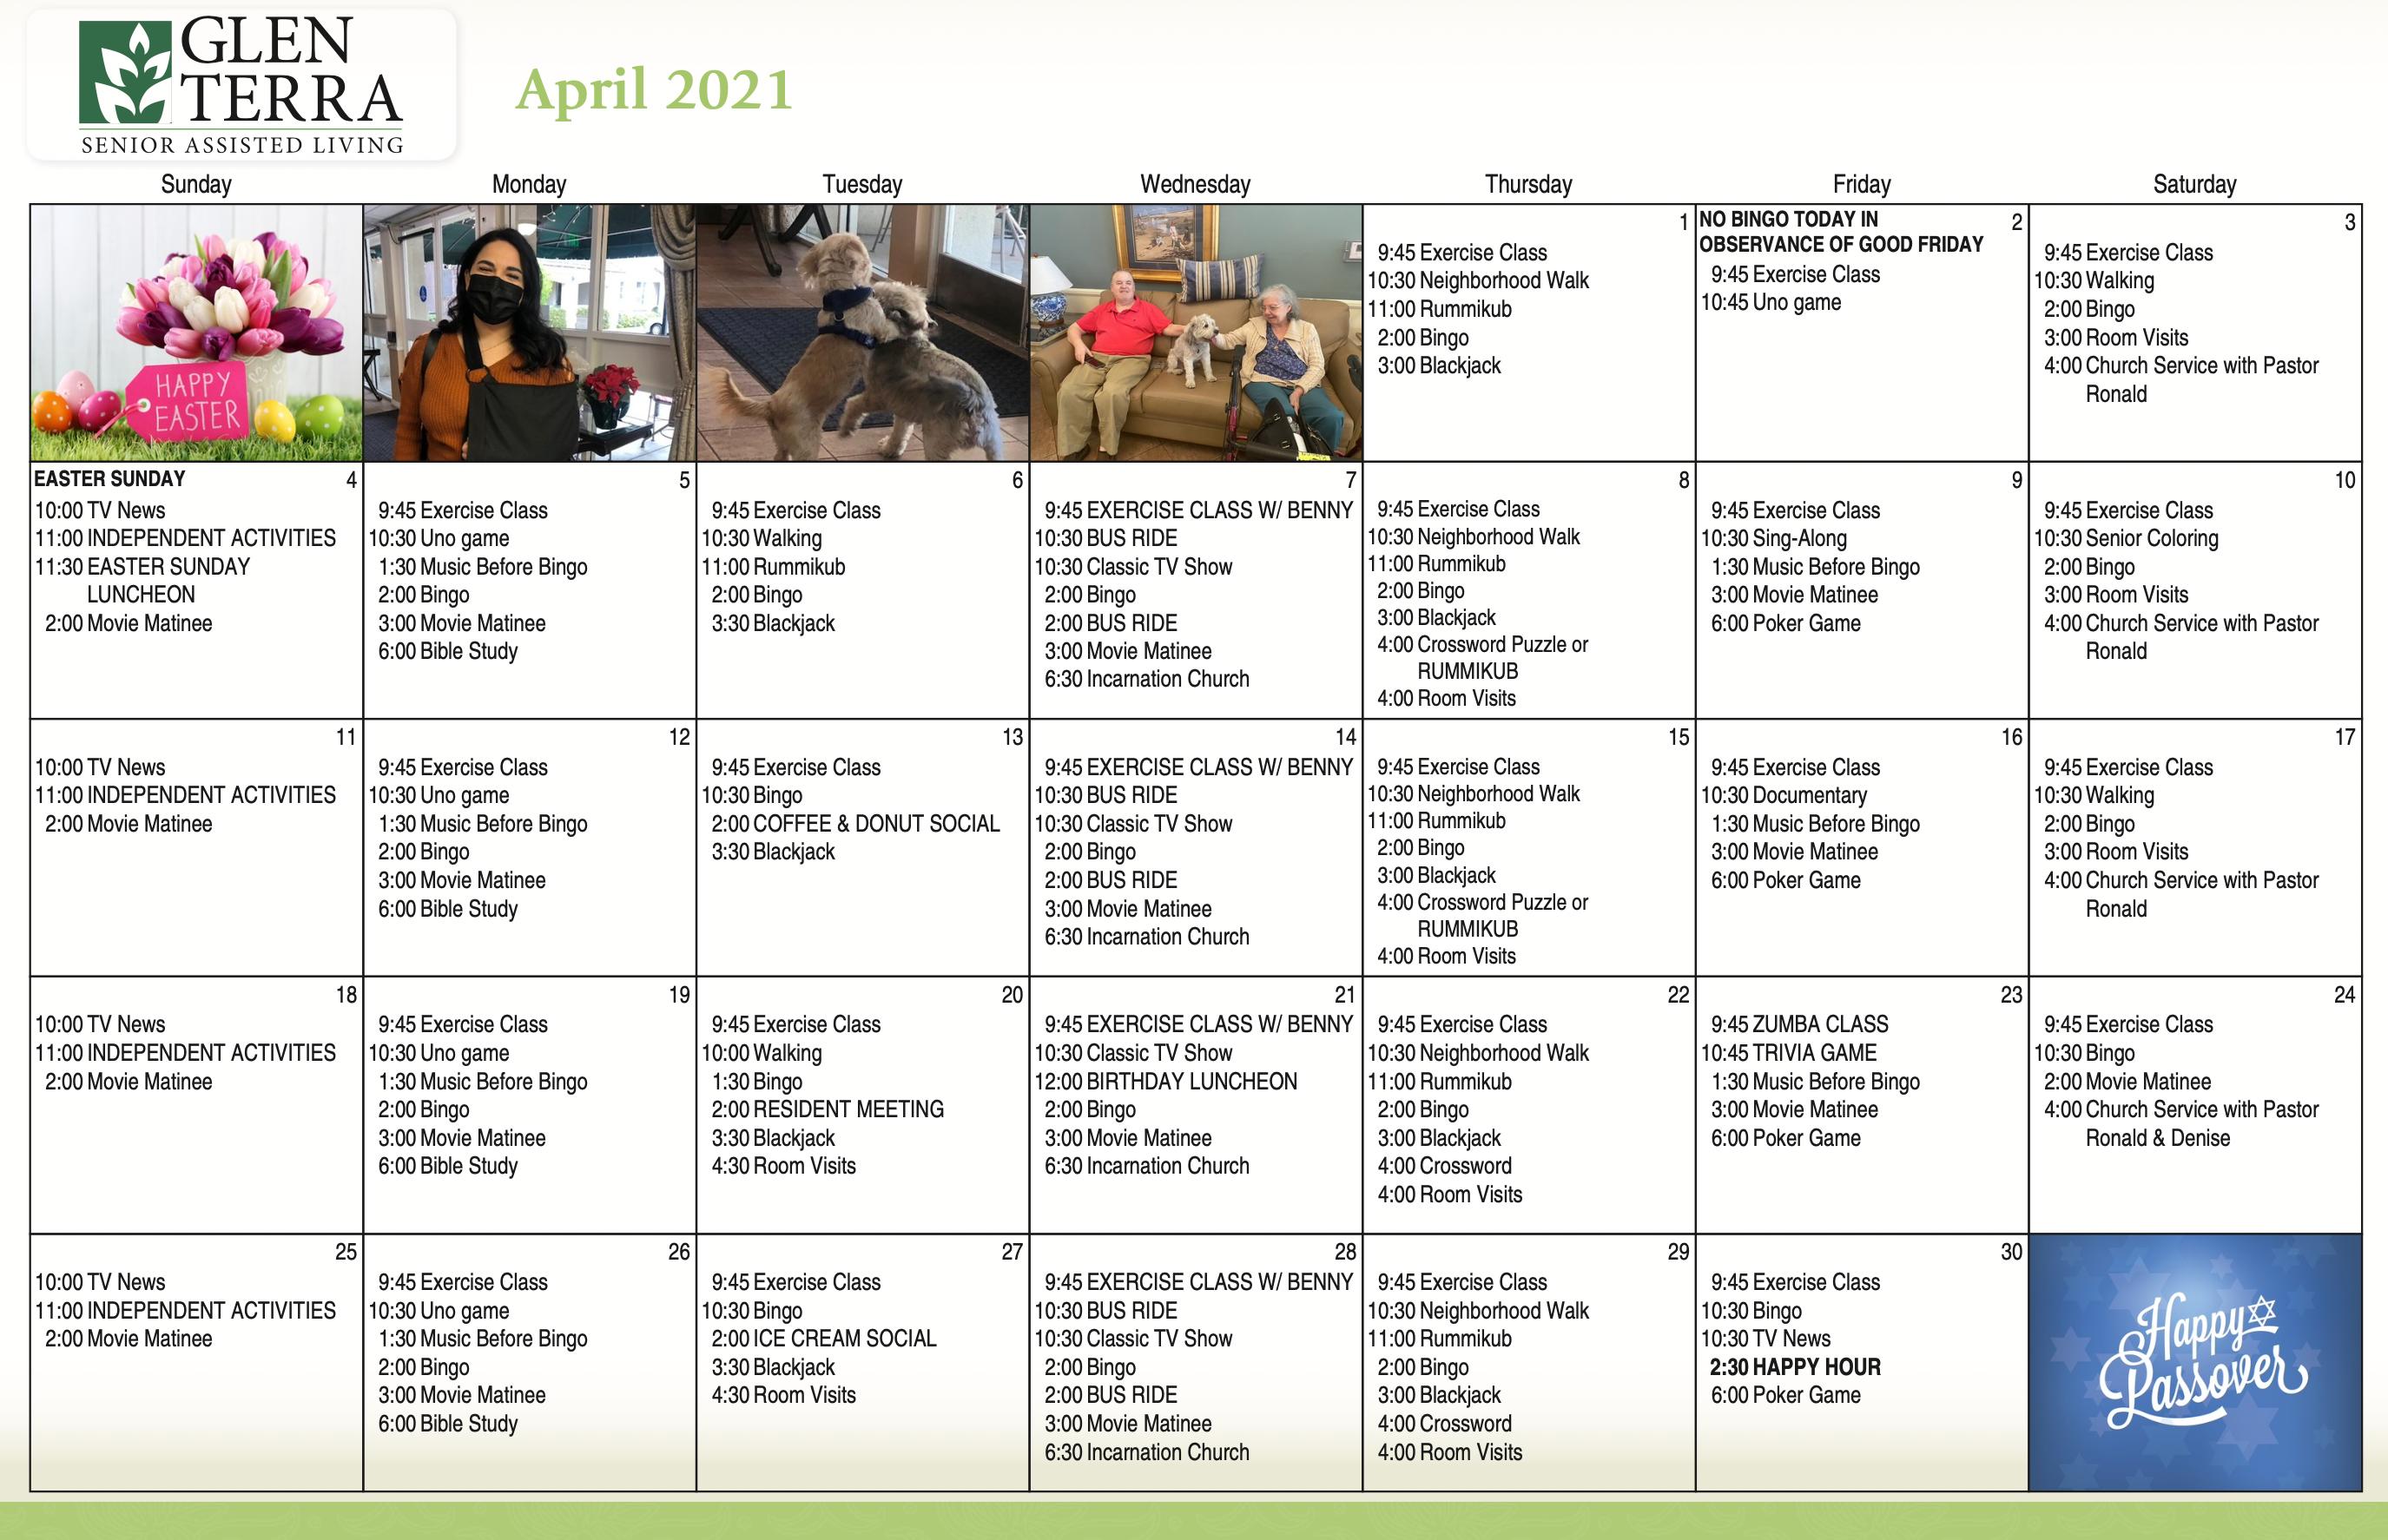 April 2021 Glen Terra Calendar